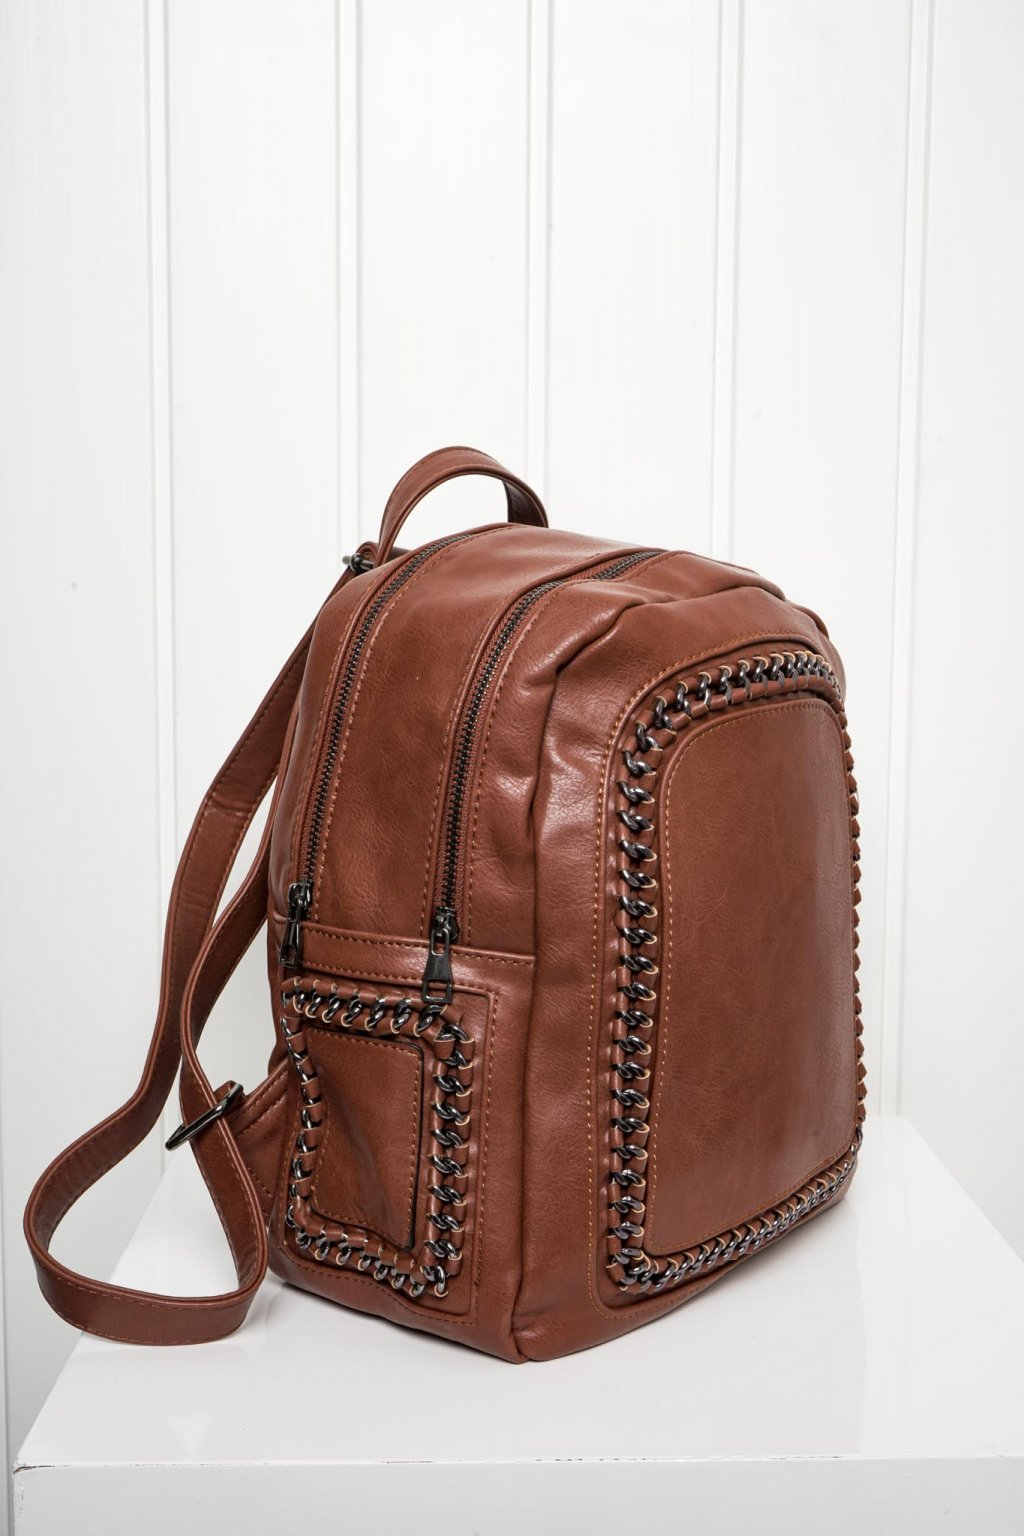 Kabelka, crossbody, ruksak, shopping bag, shopperka, 483